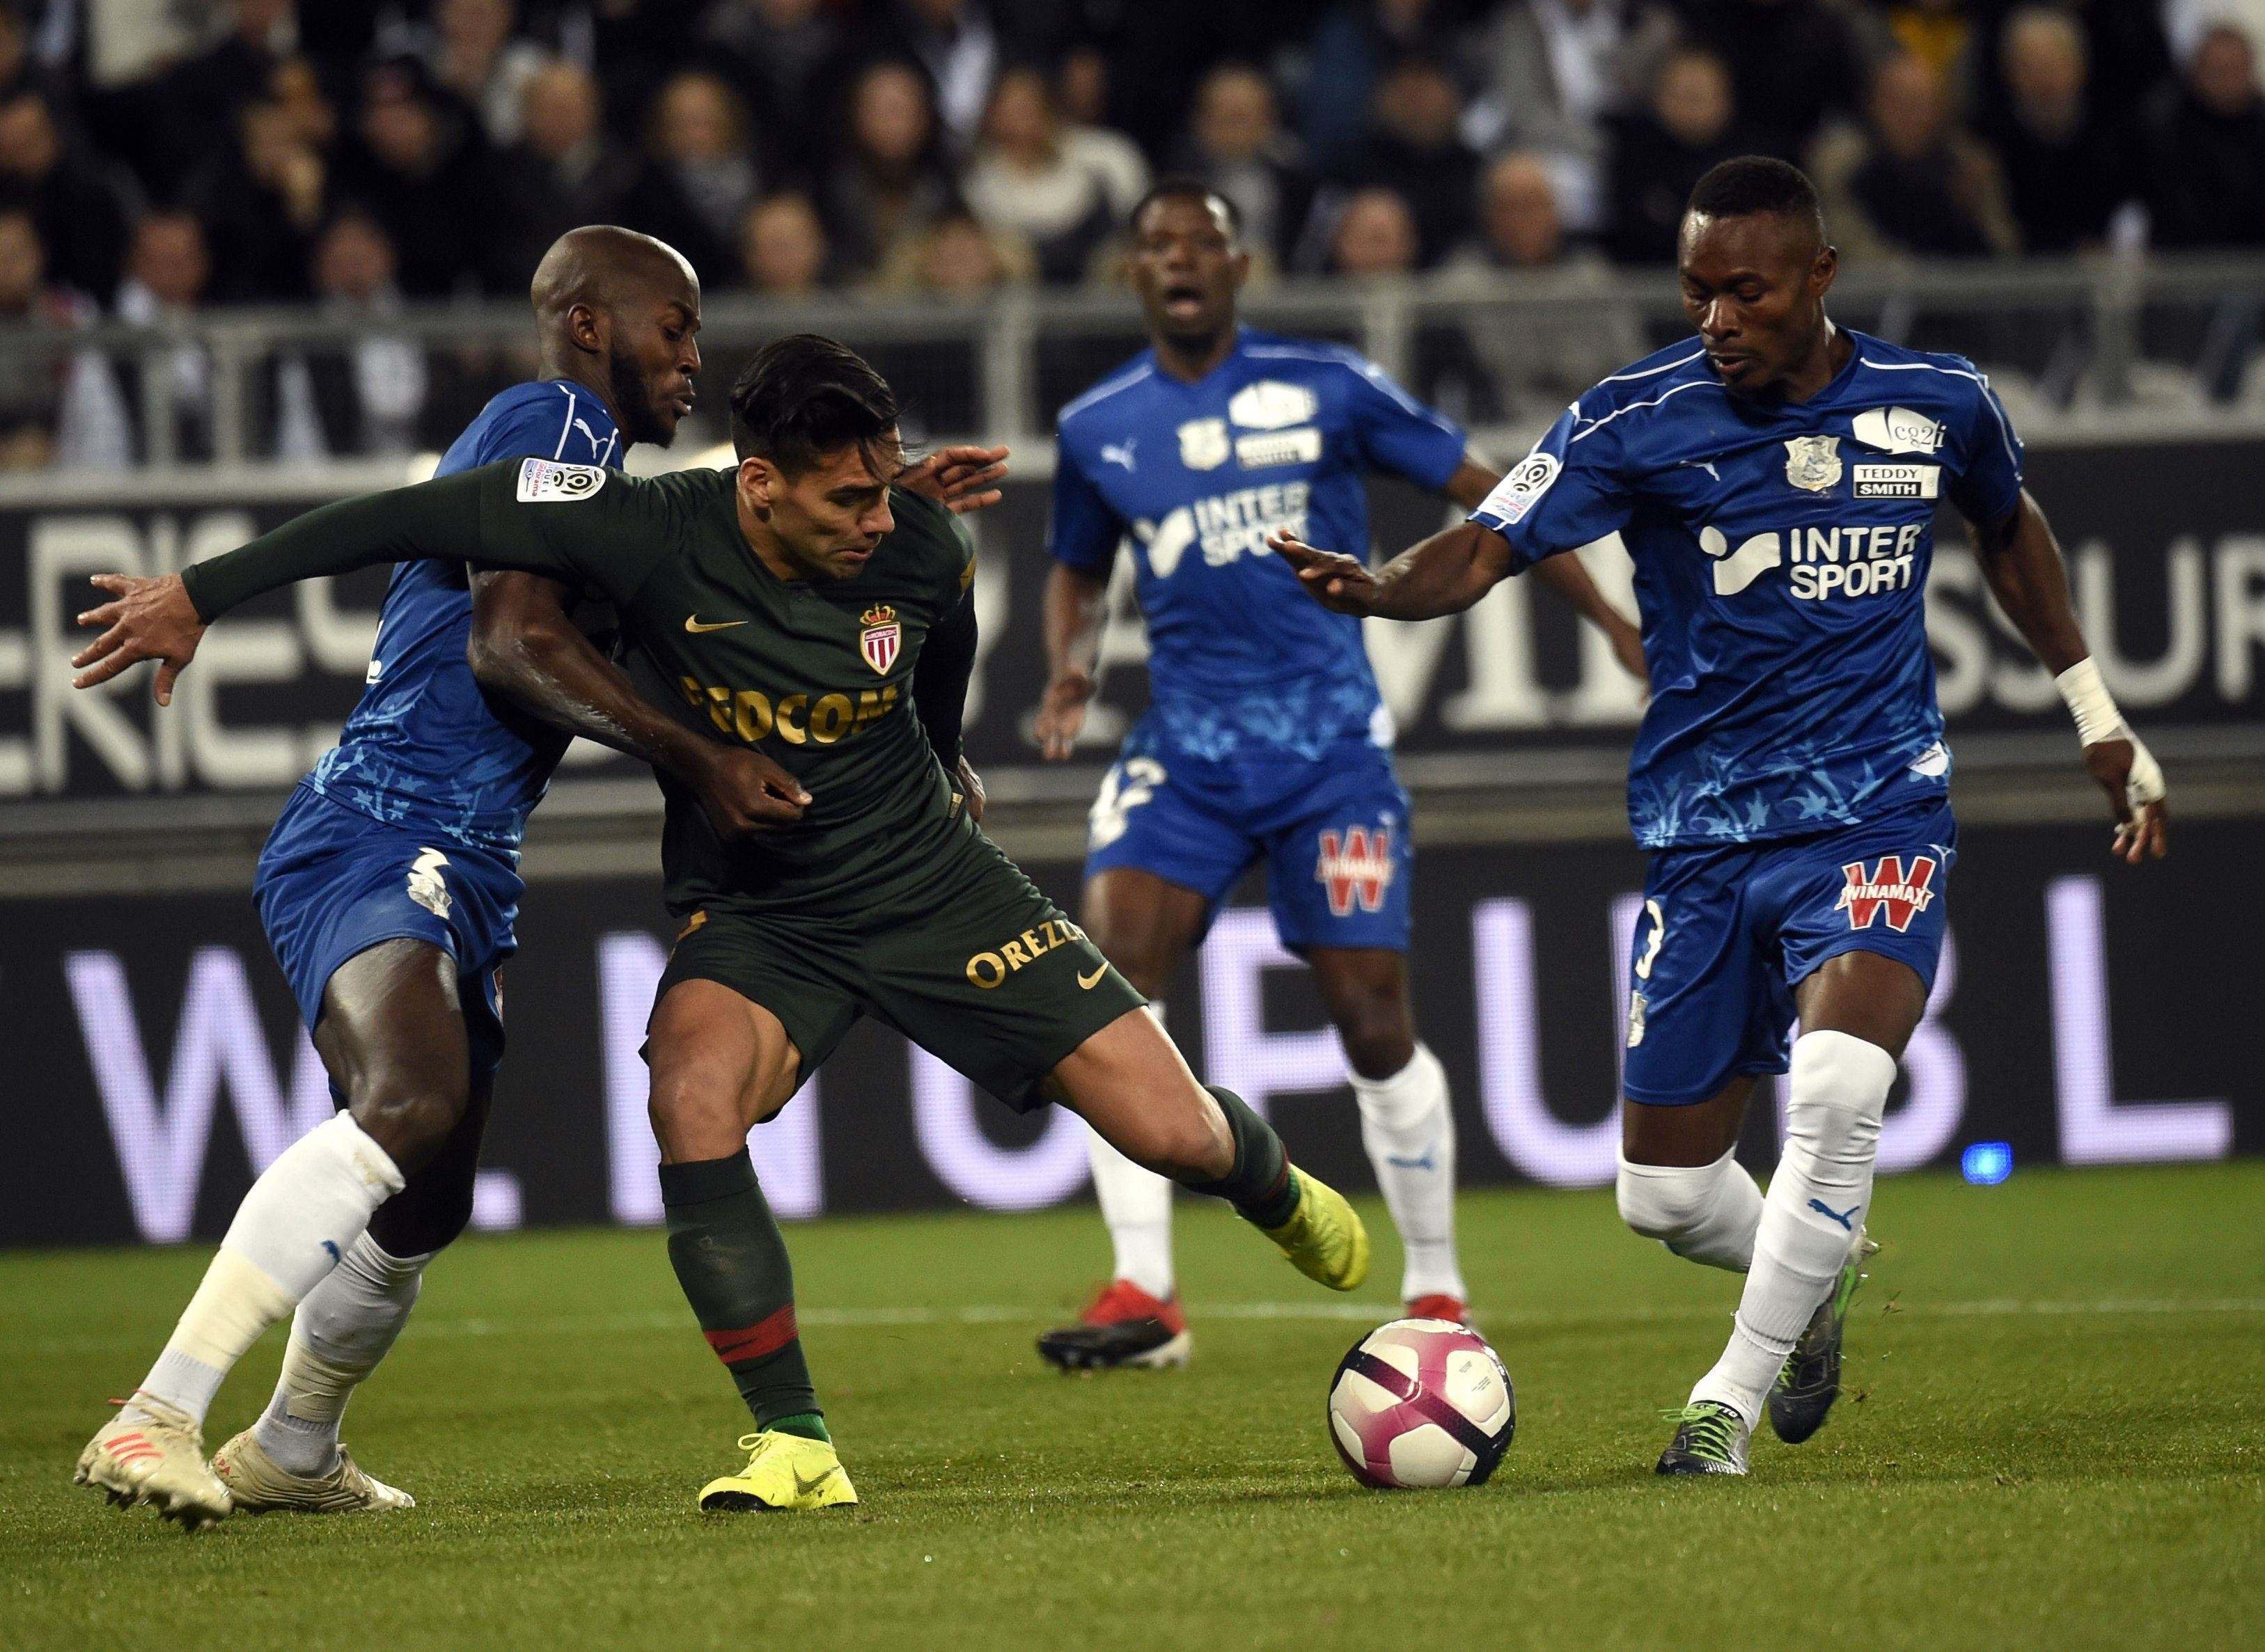 Radamel Falcao lors d'Amiens-Monaco / Ligue 1